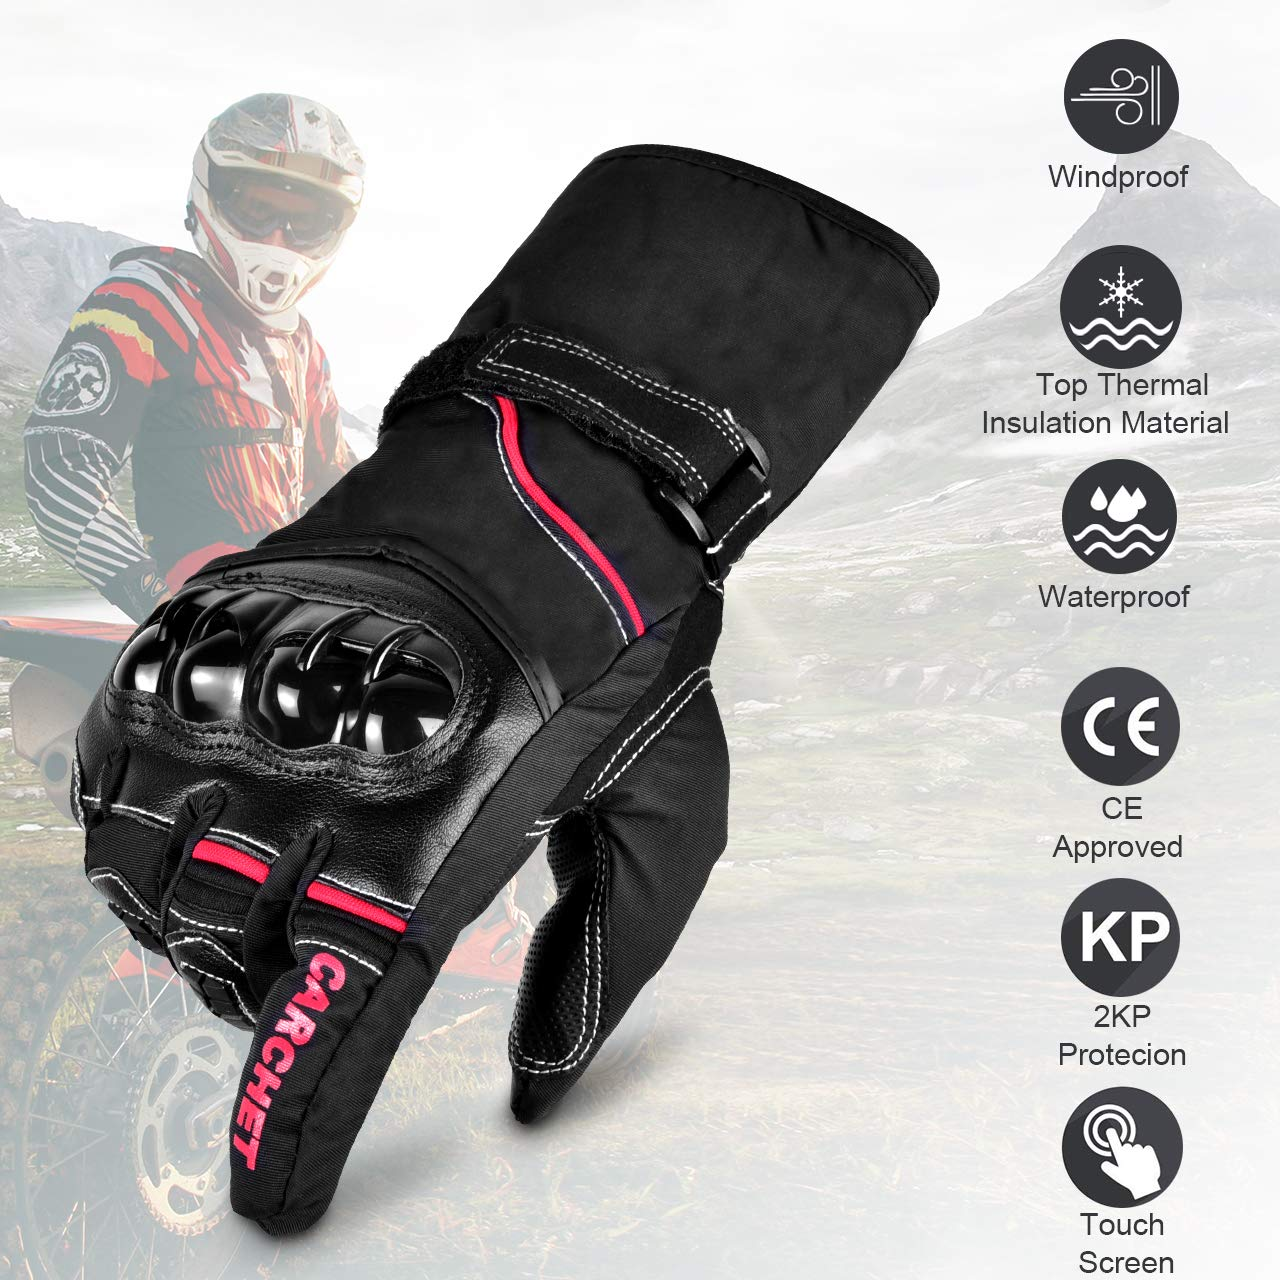 Guantes de Moto Invierno, CARCHET Guantes Impermeable de Pantalla Tá ctil Dedo Completo Anti-Viento para Motocicleta Excursió n Bici Ciclismo Deporte Talla XL guantes XL